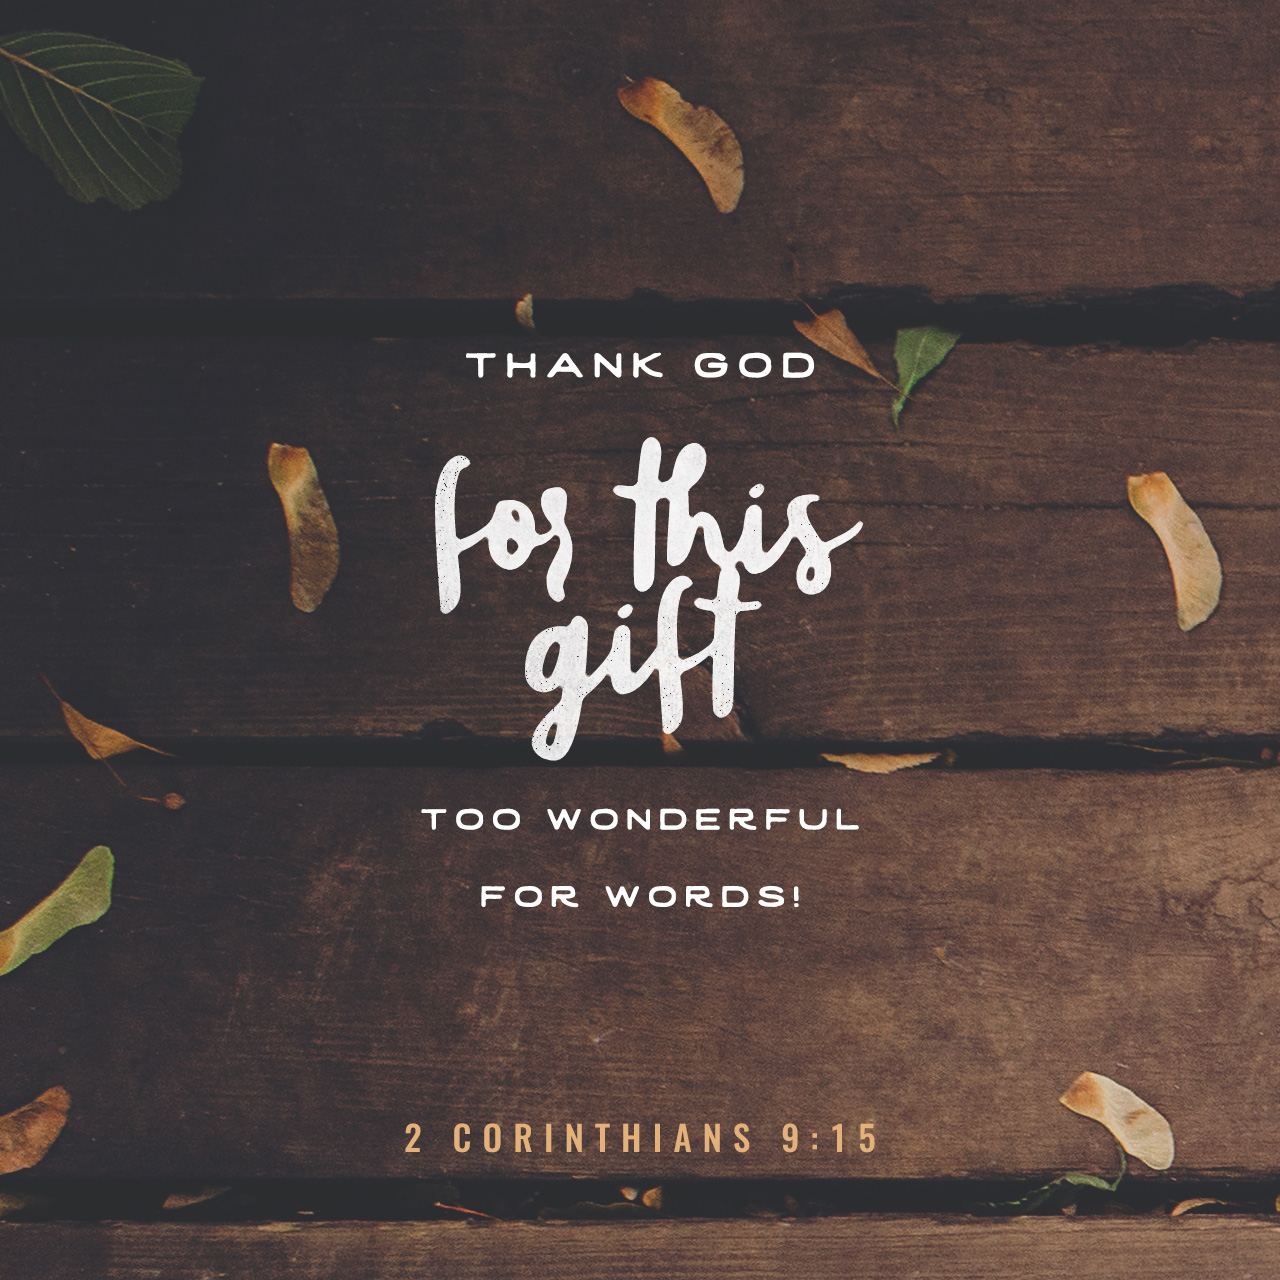 2 Corinthians 9:15